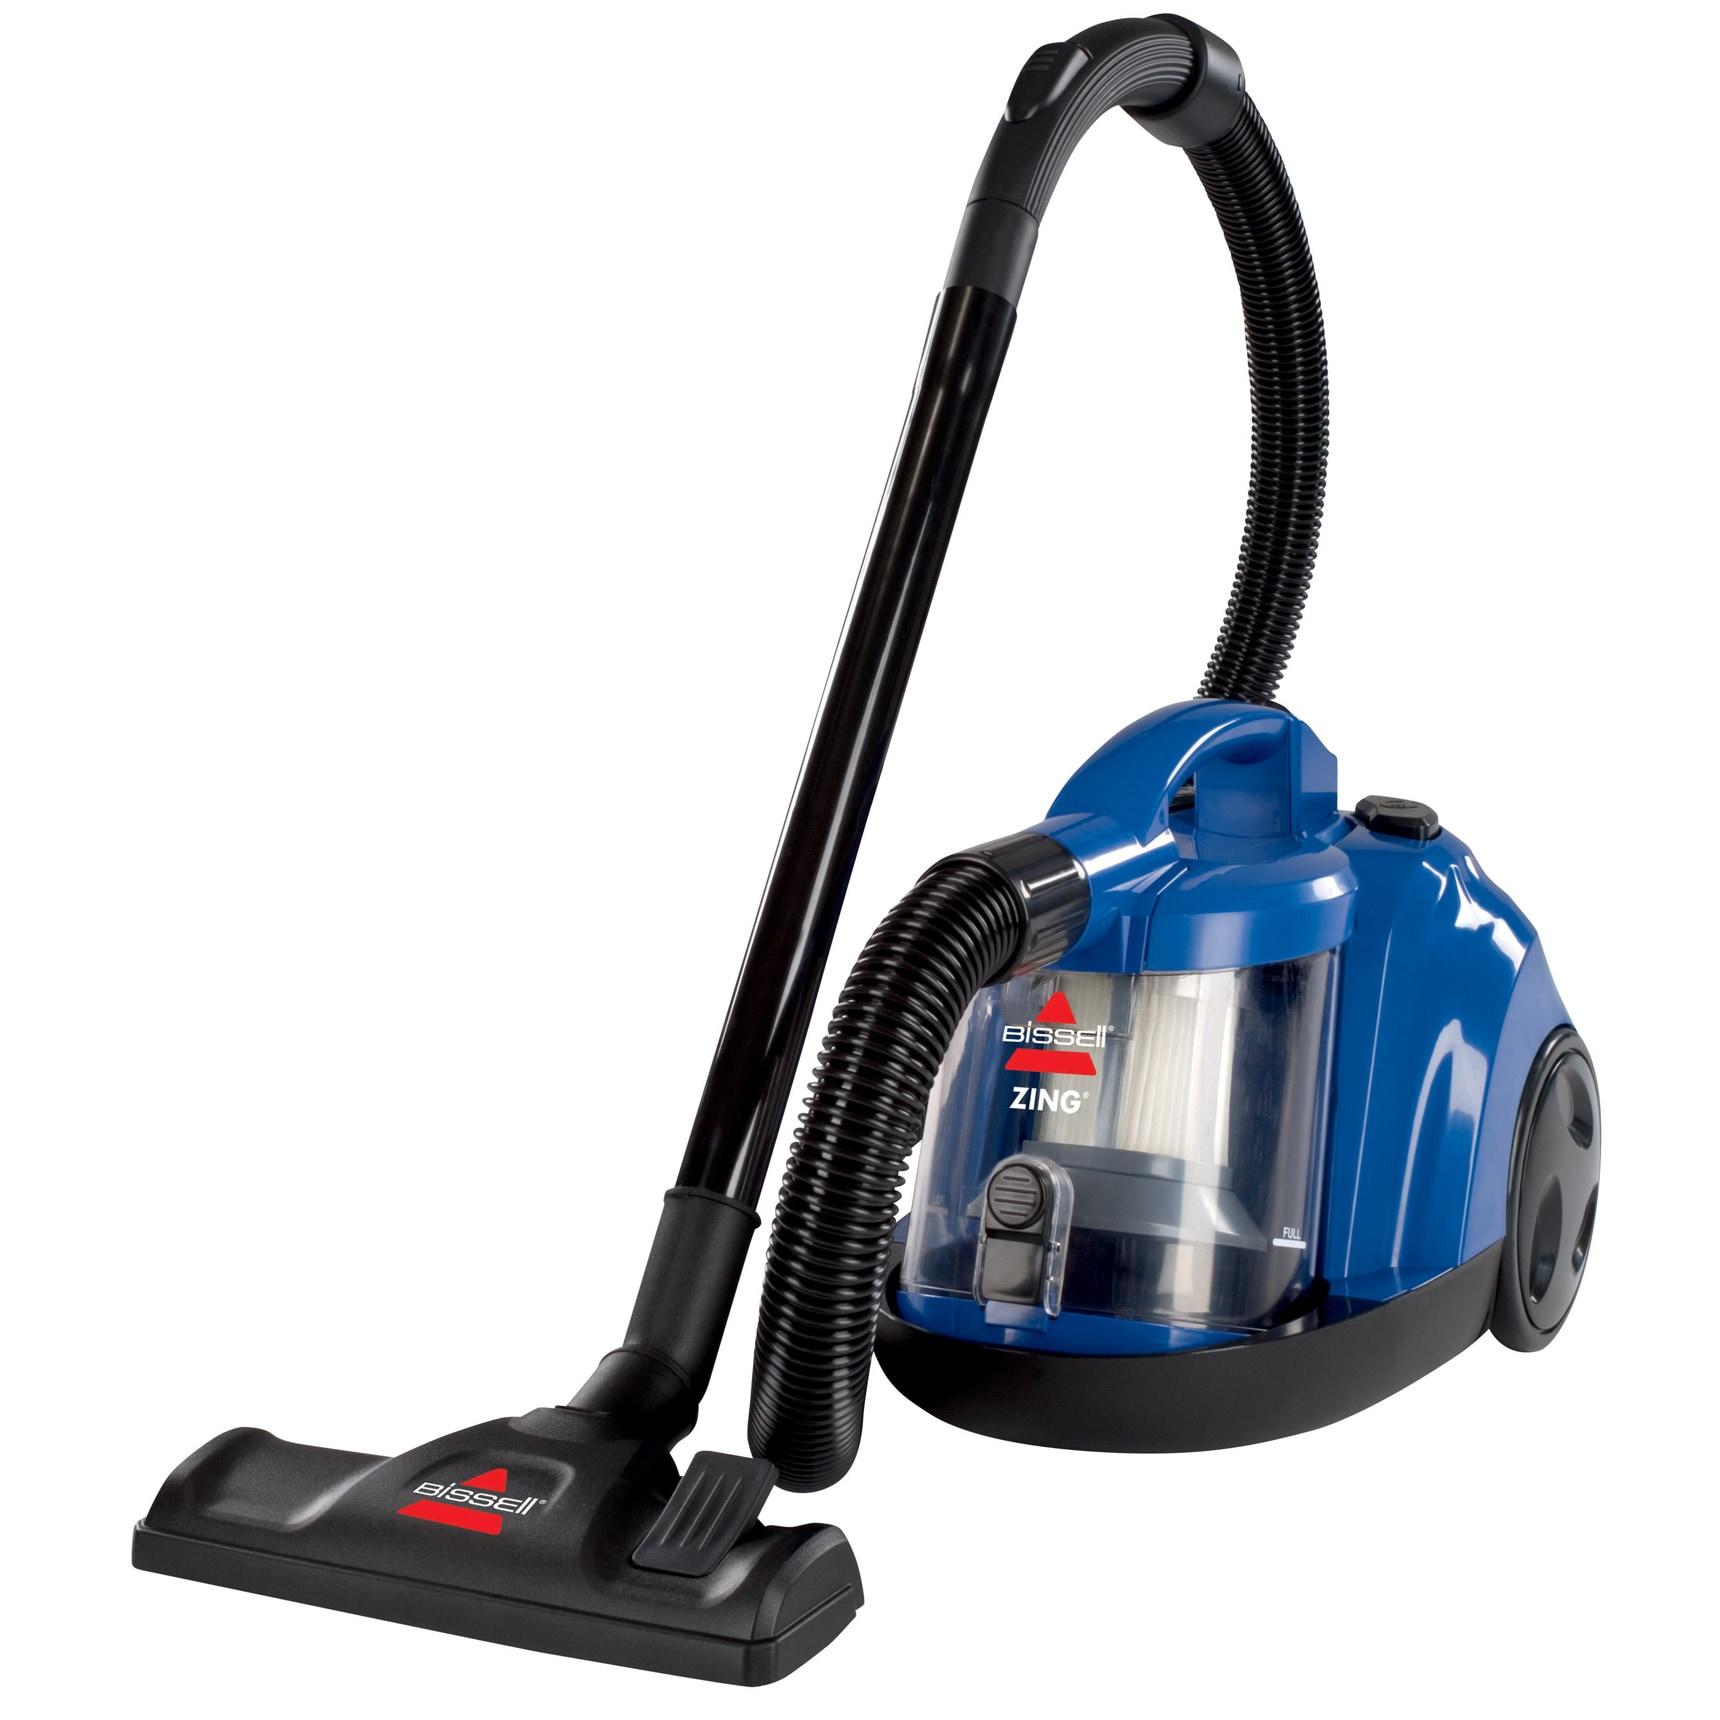 ... Helix Bagless Upright Vacuum Gray Blue 12B1 Free Shipping   eBay